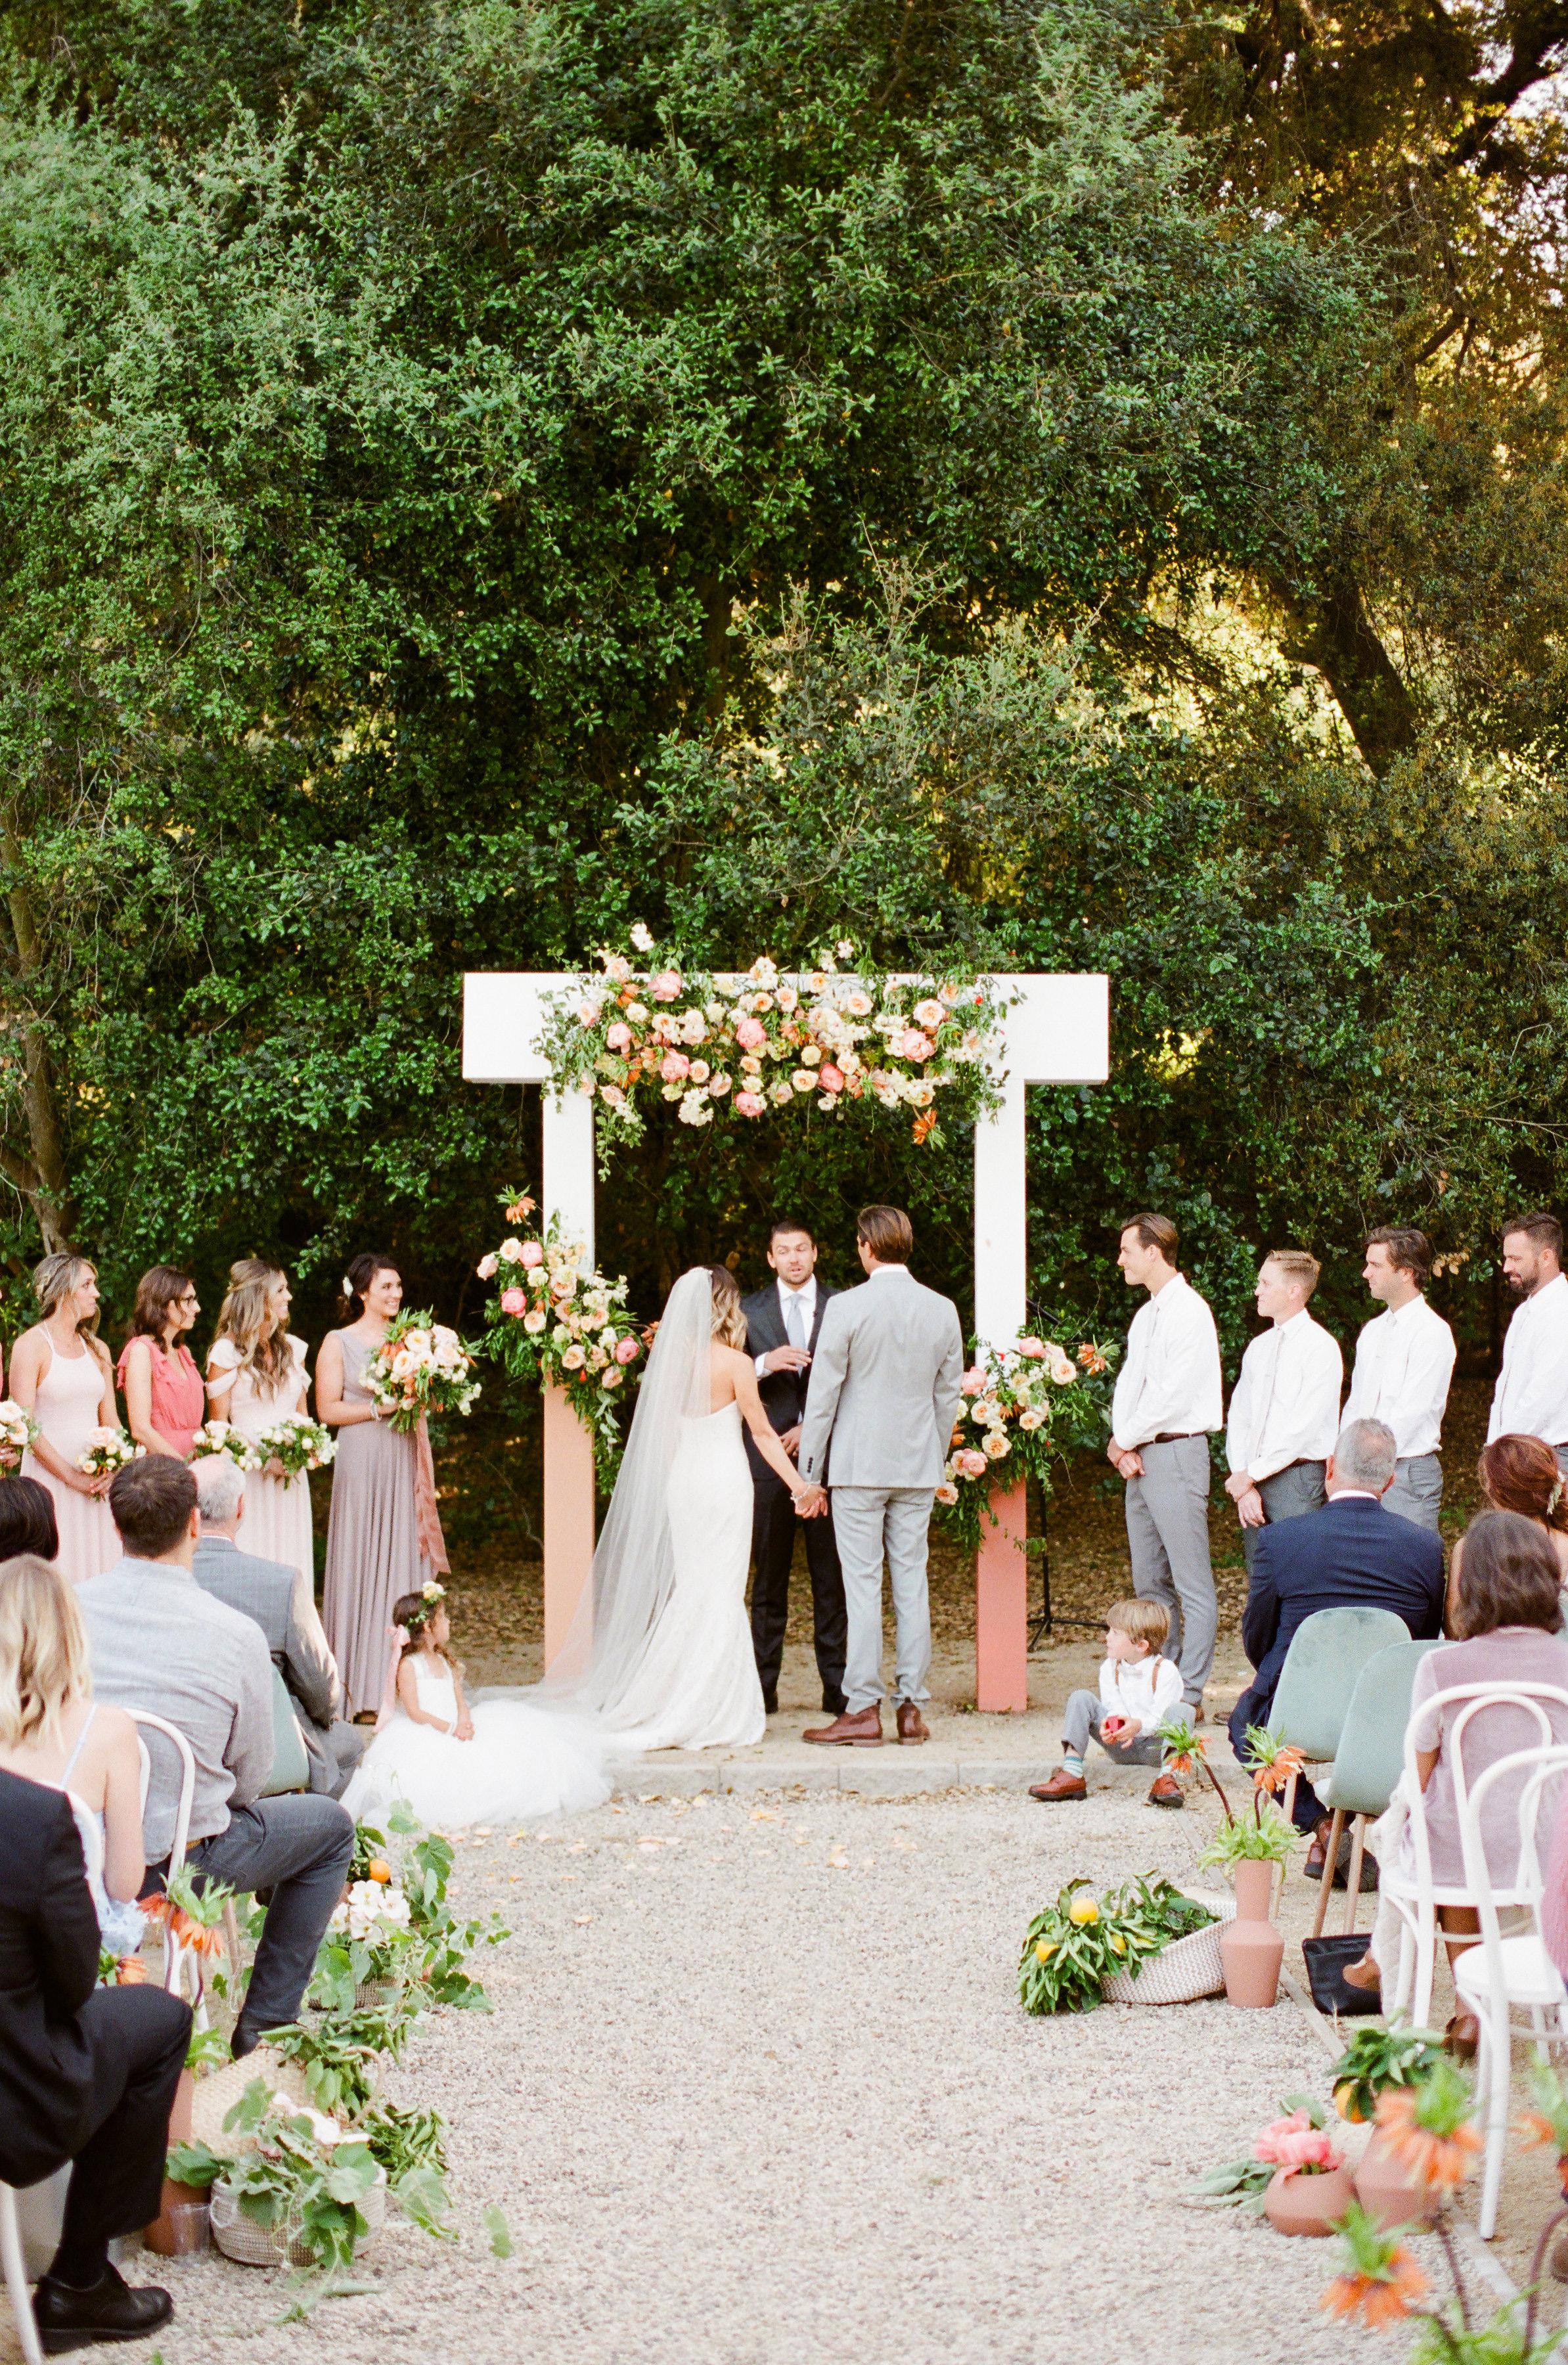 Tenley molzahn taylor leopold wedding ceremony